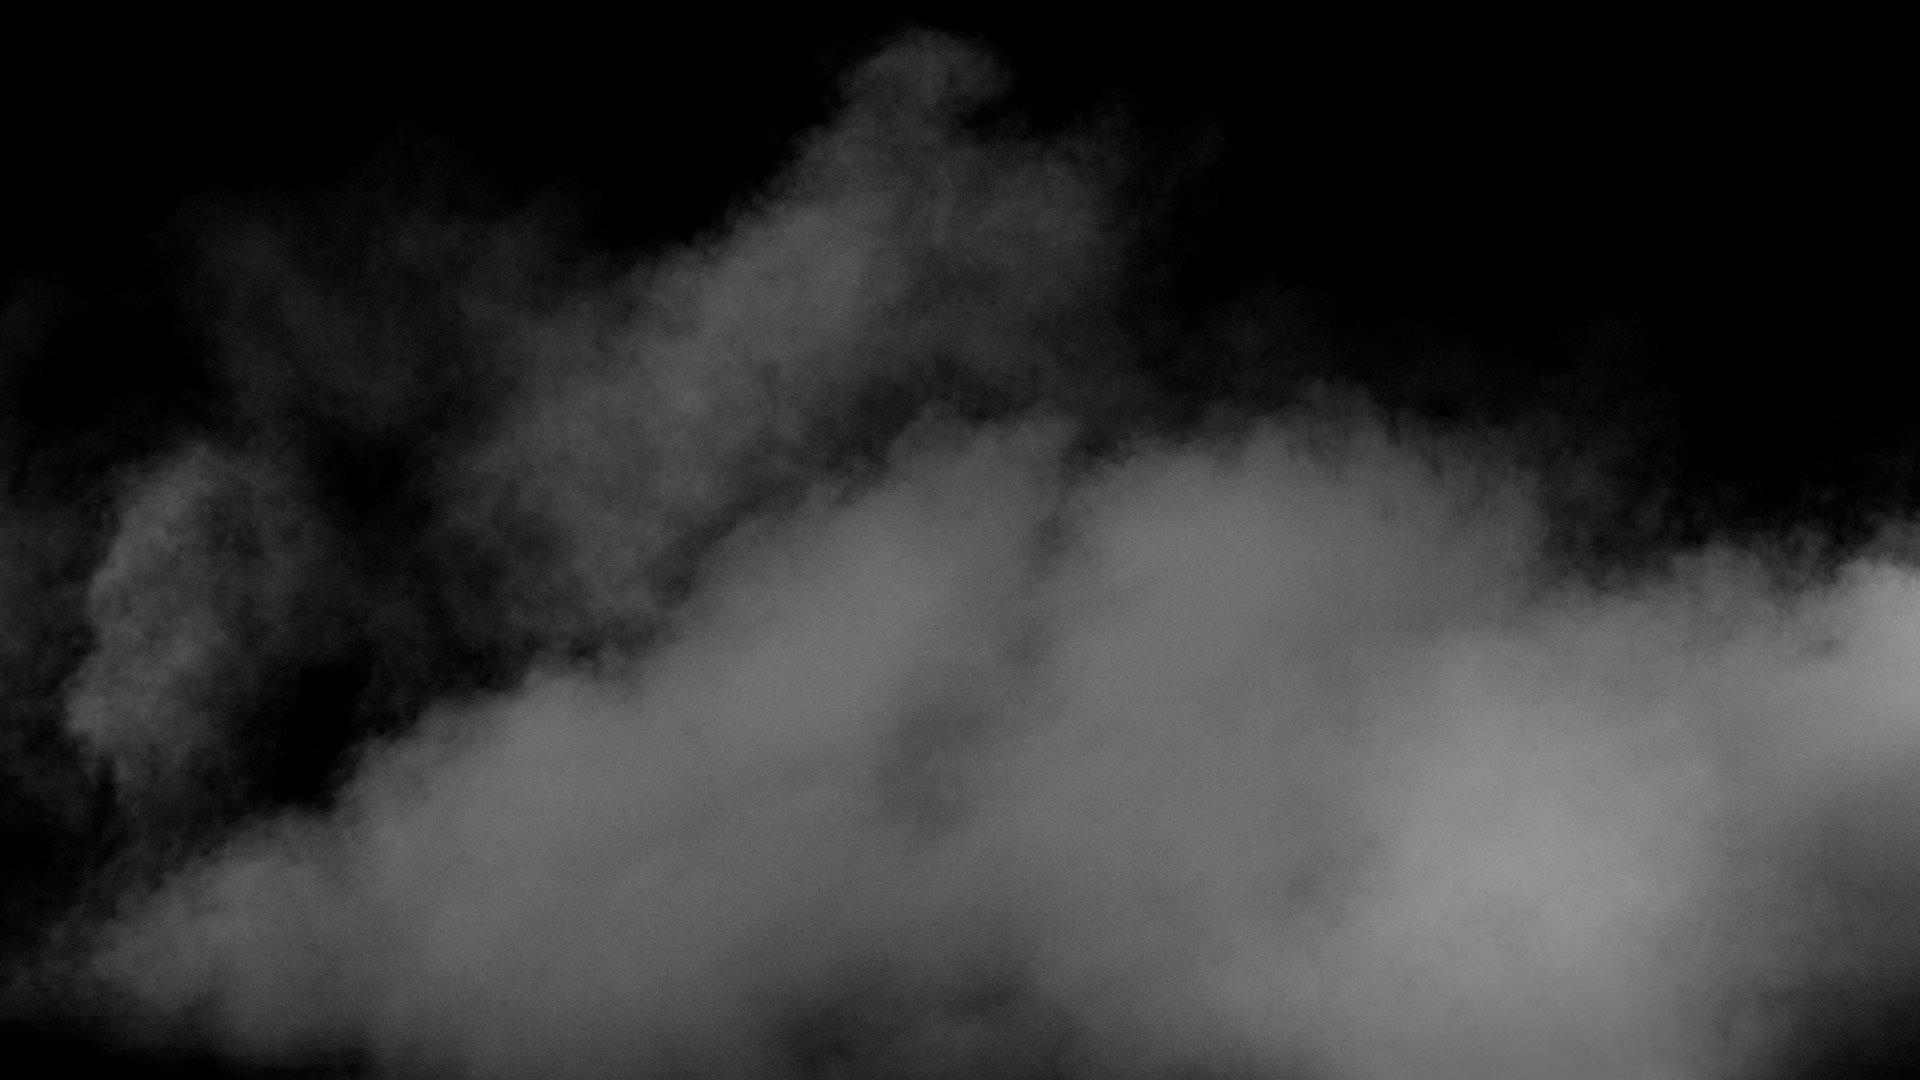 Atmospheric Smoke & Fog Stock Footage Collection | ActionVFX